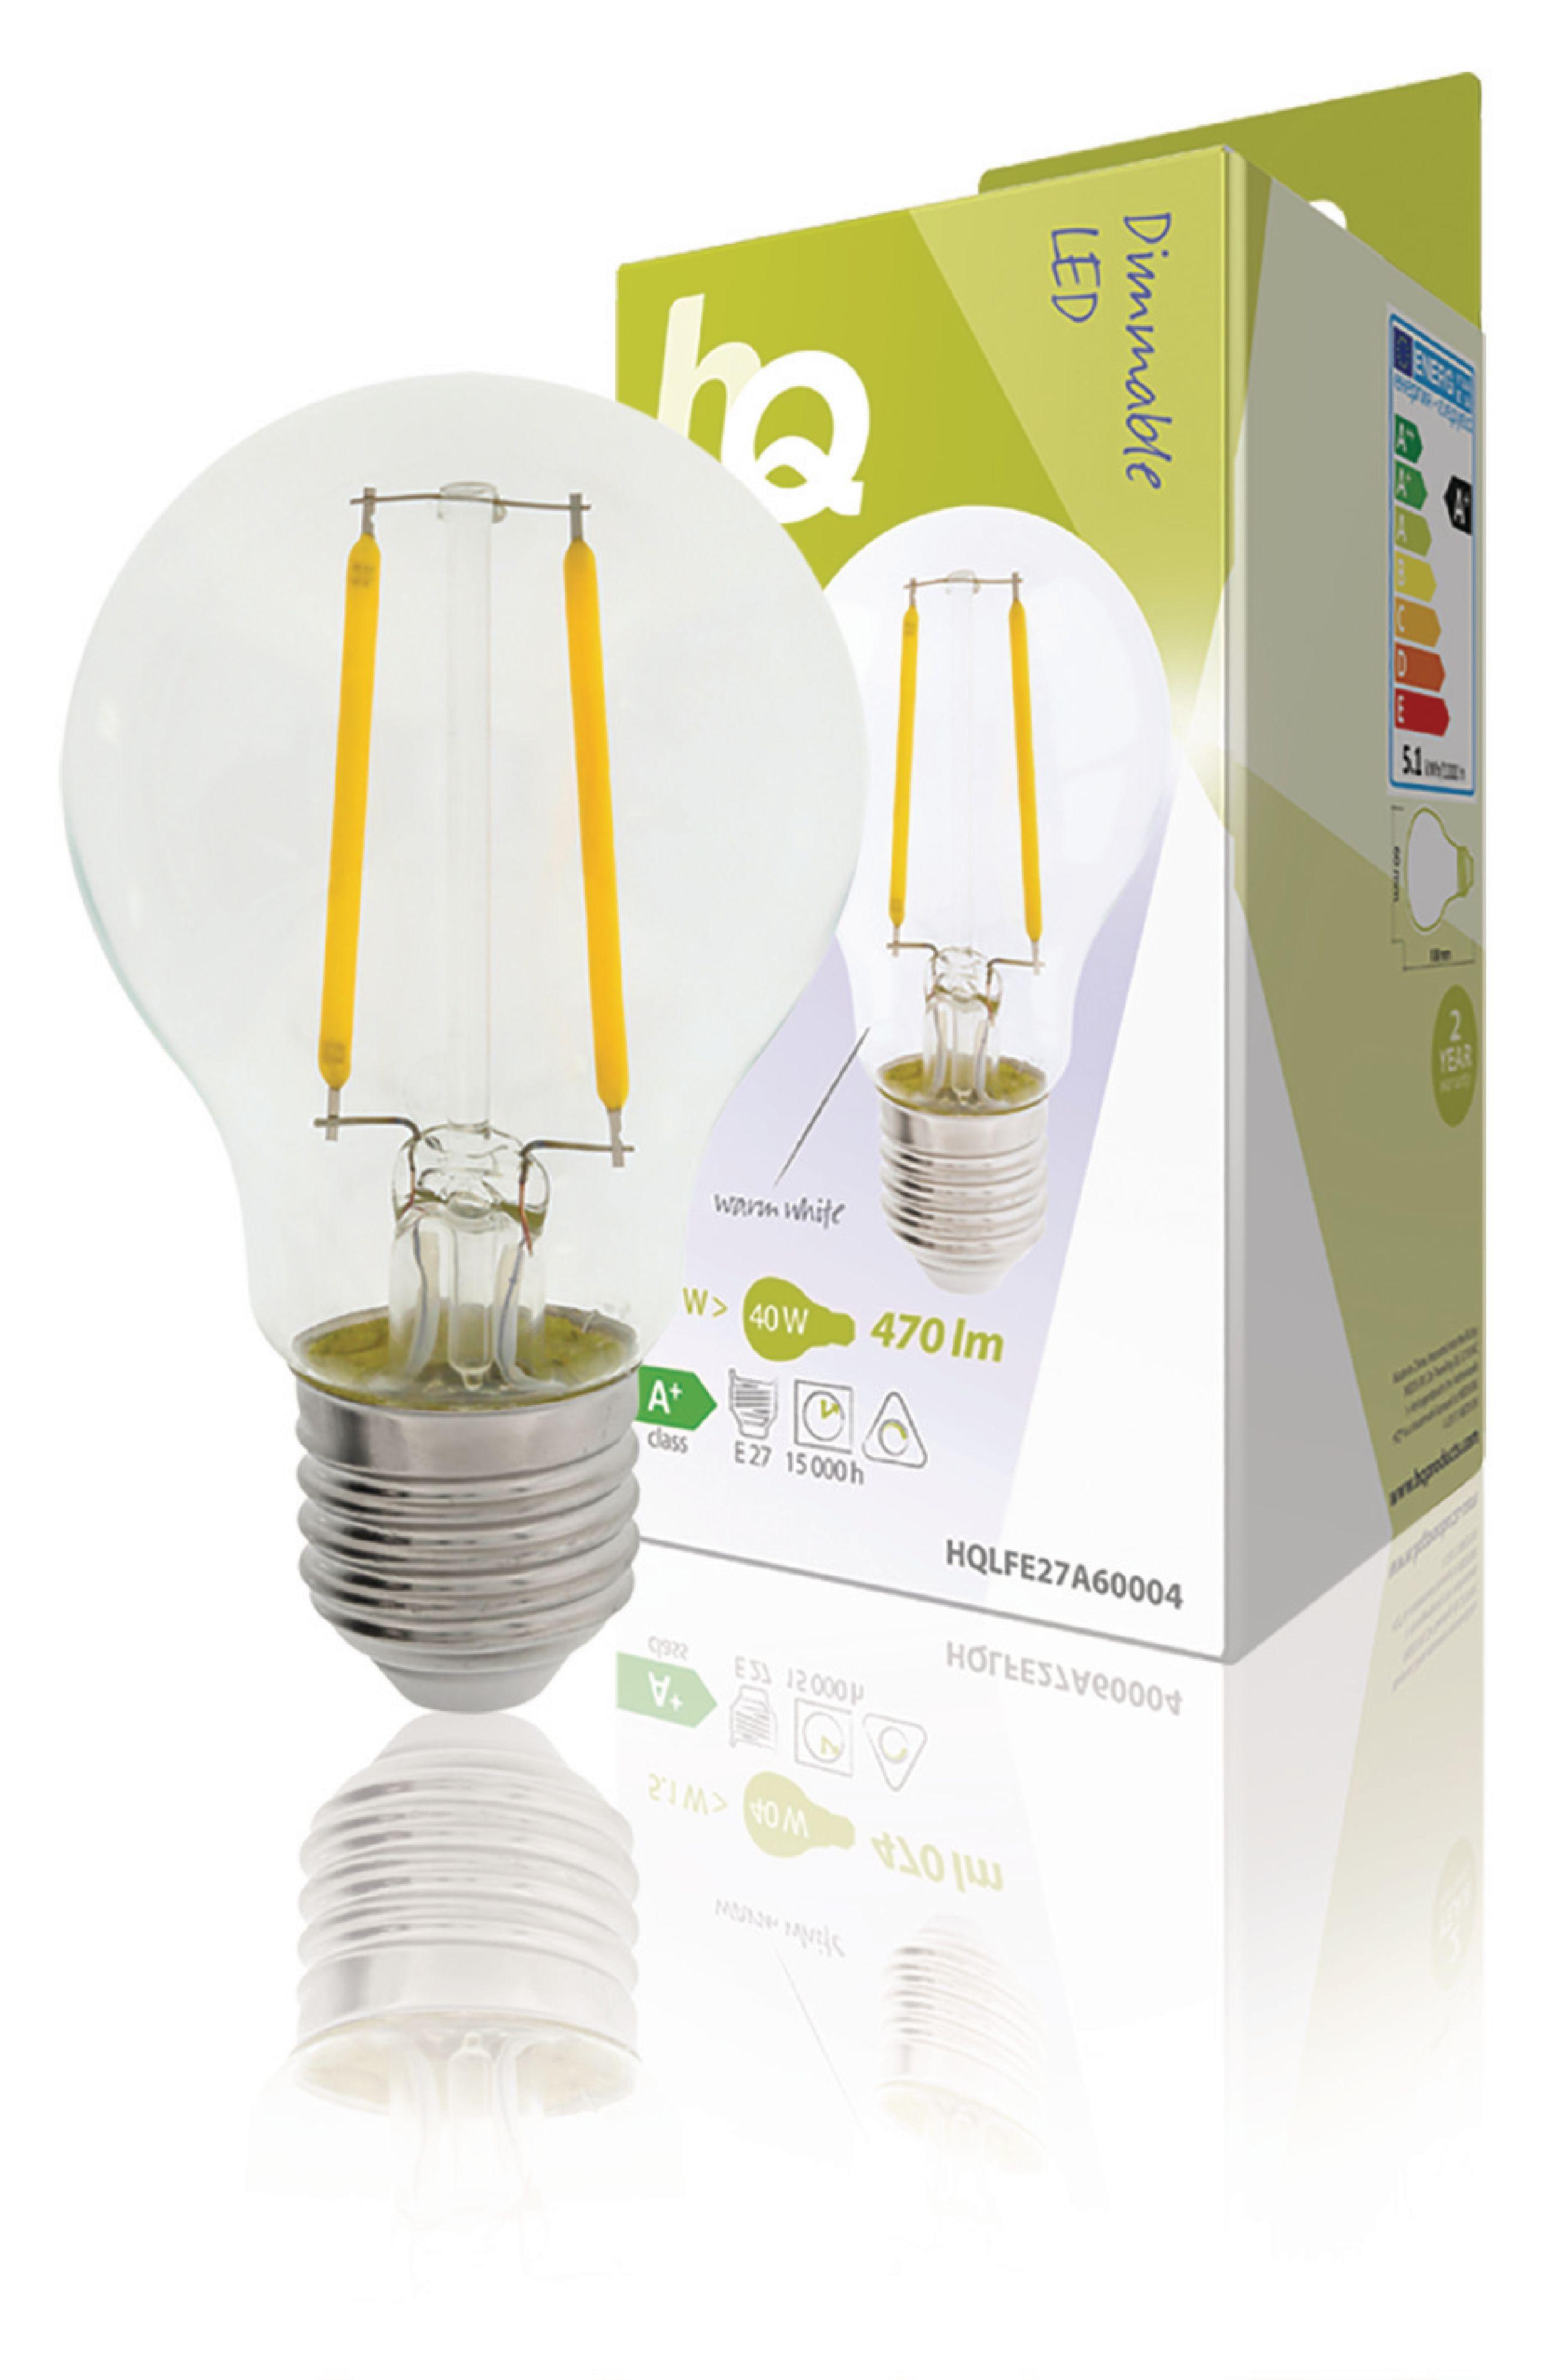 gluhlampe-led-vintage-dimmbar-a60-51-w-470-lm-2700-k